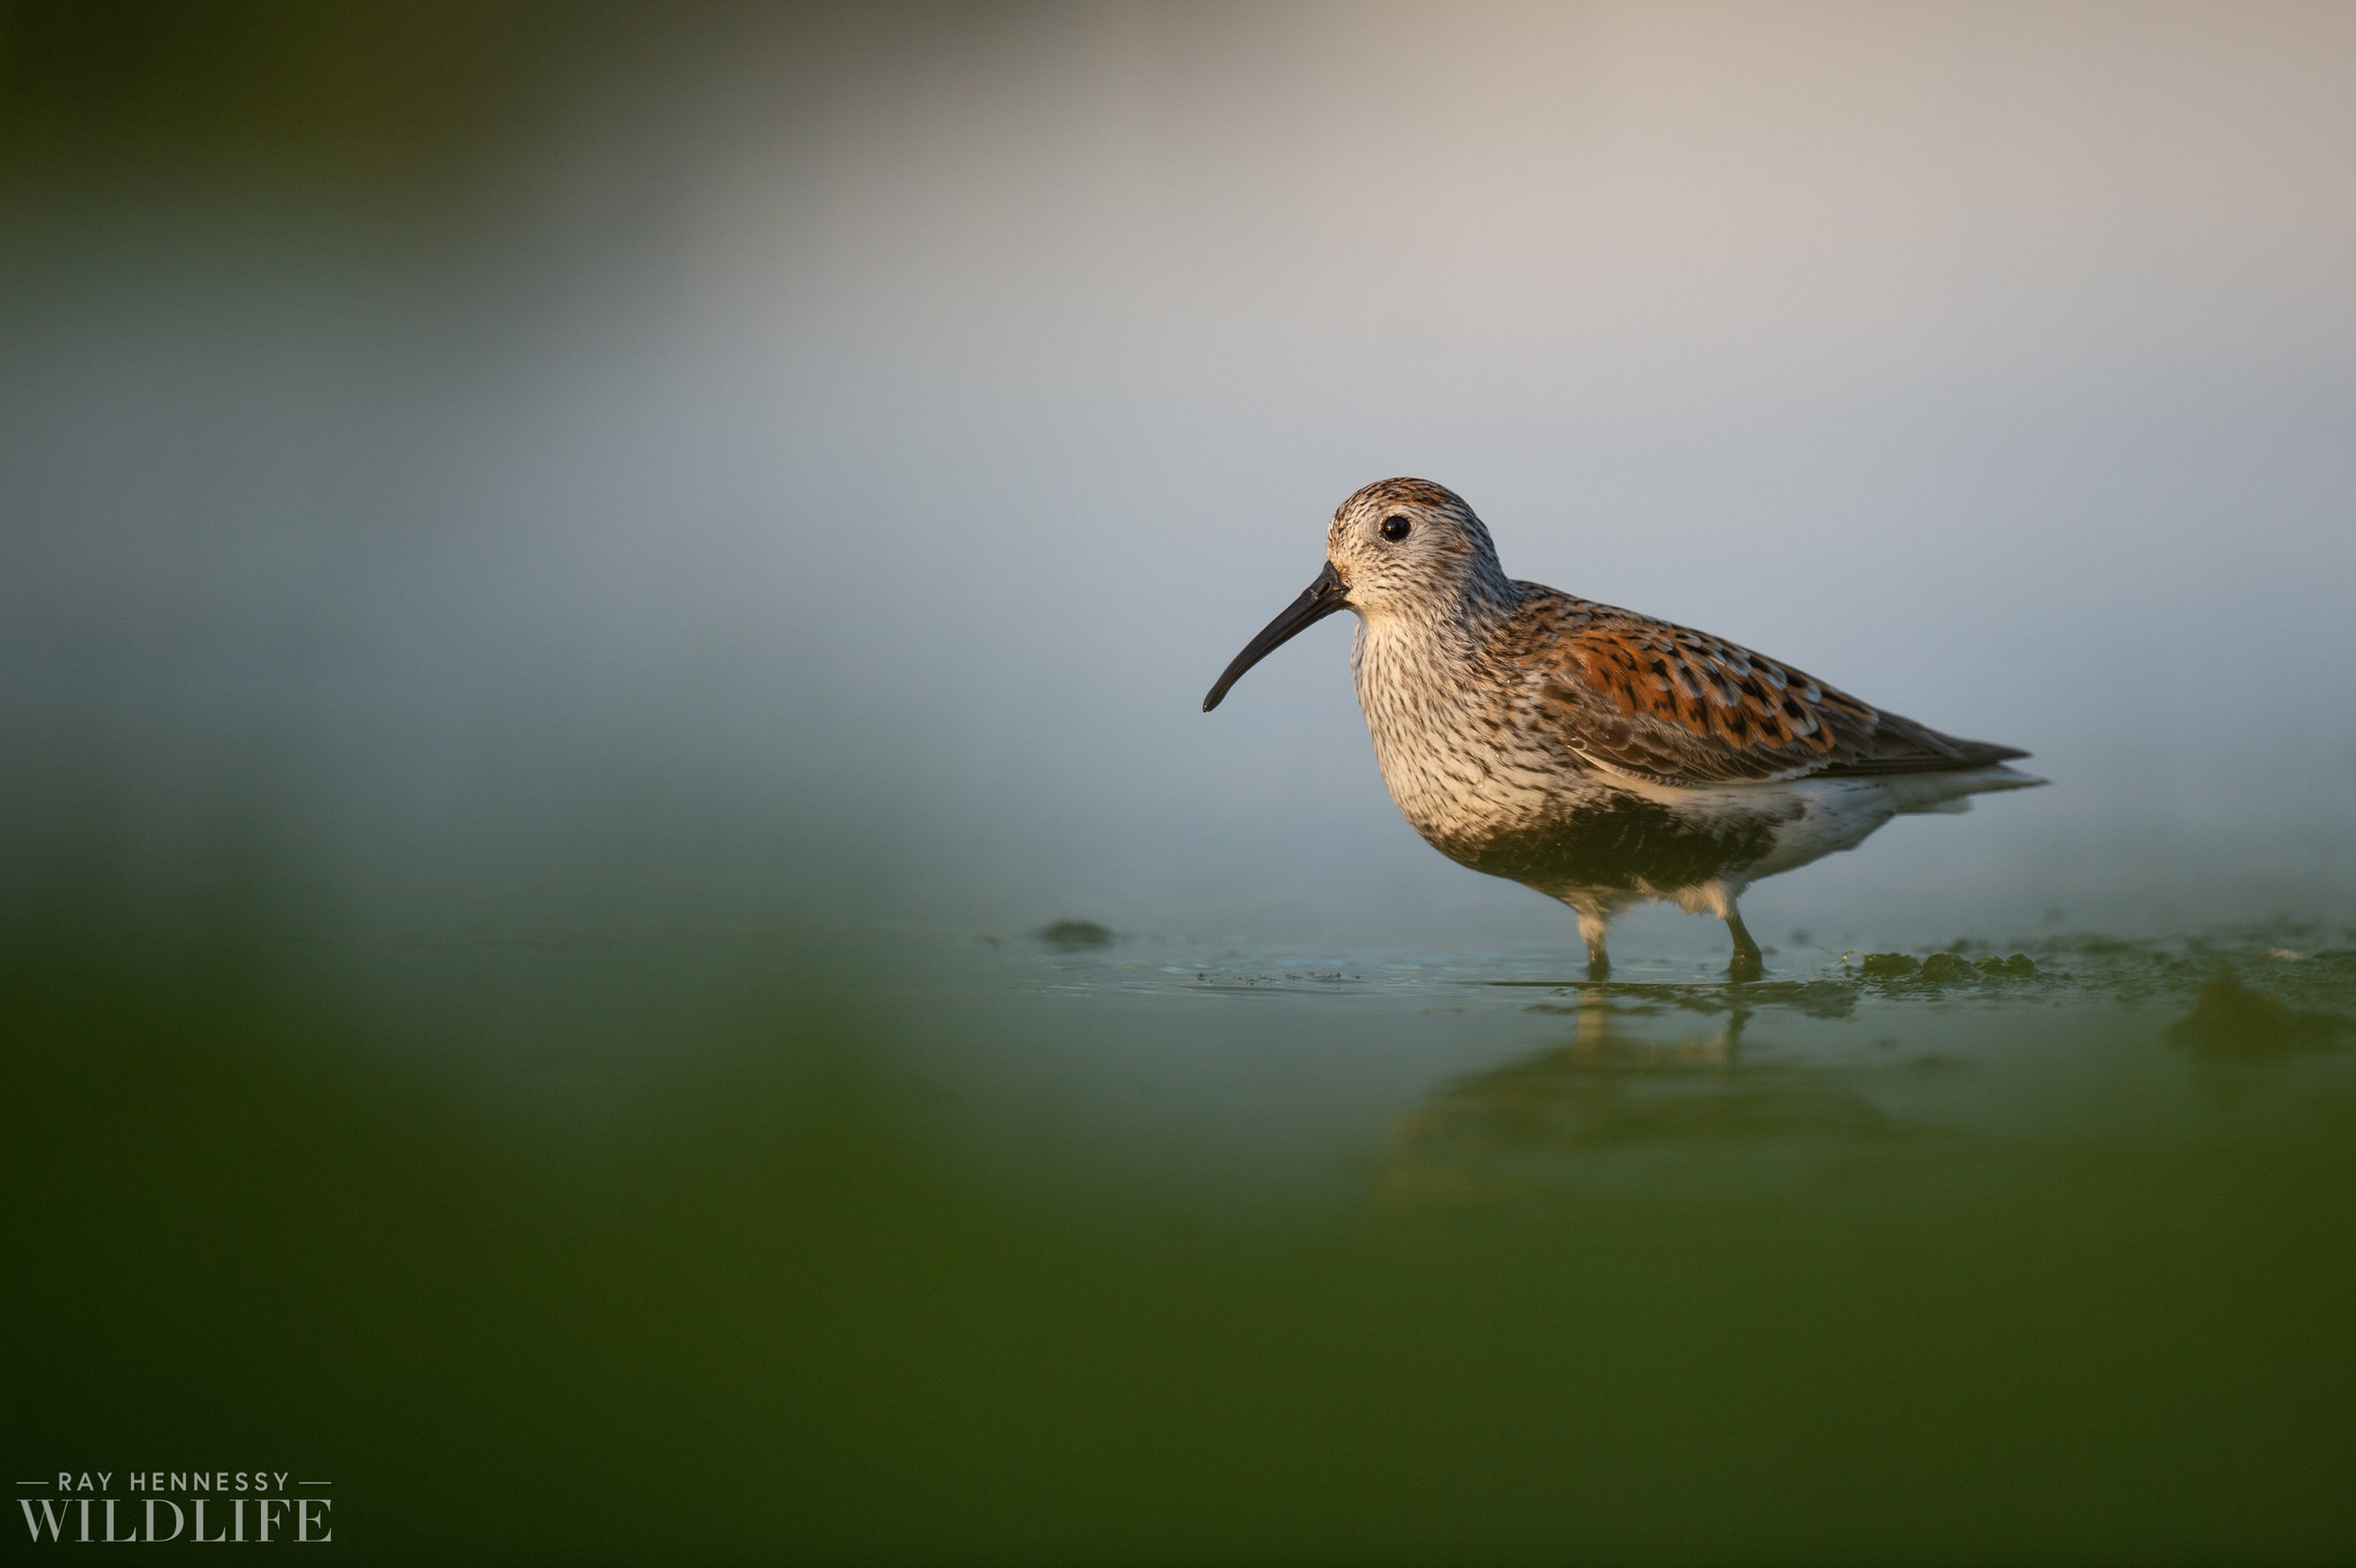 009_shorebirds-prothonotary-warbler.jpg